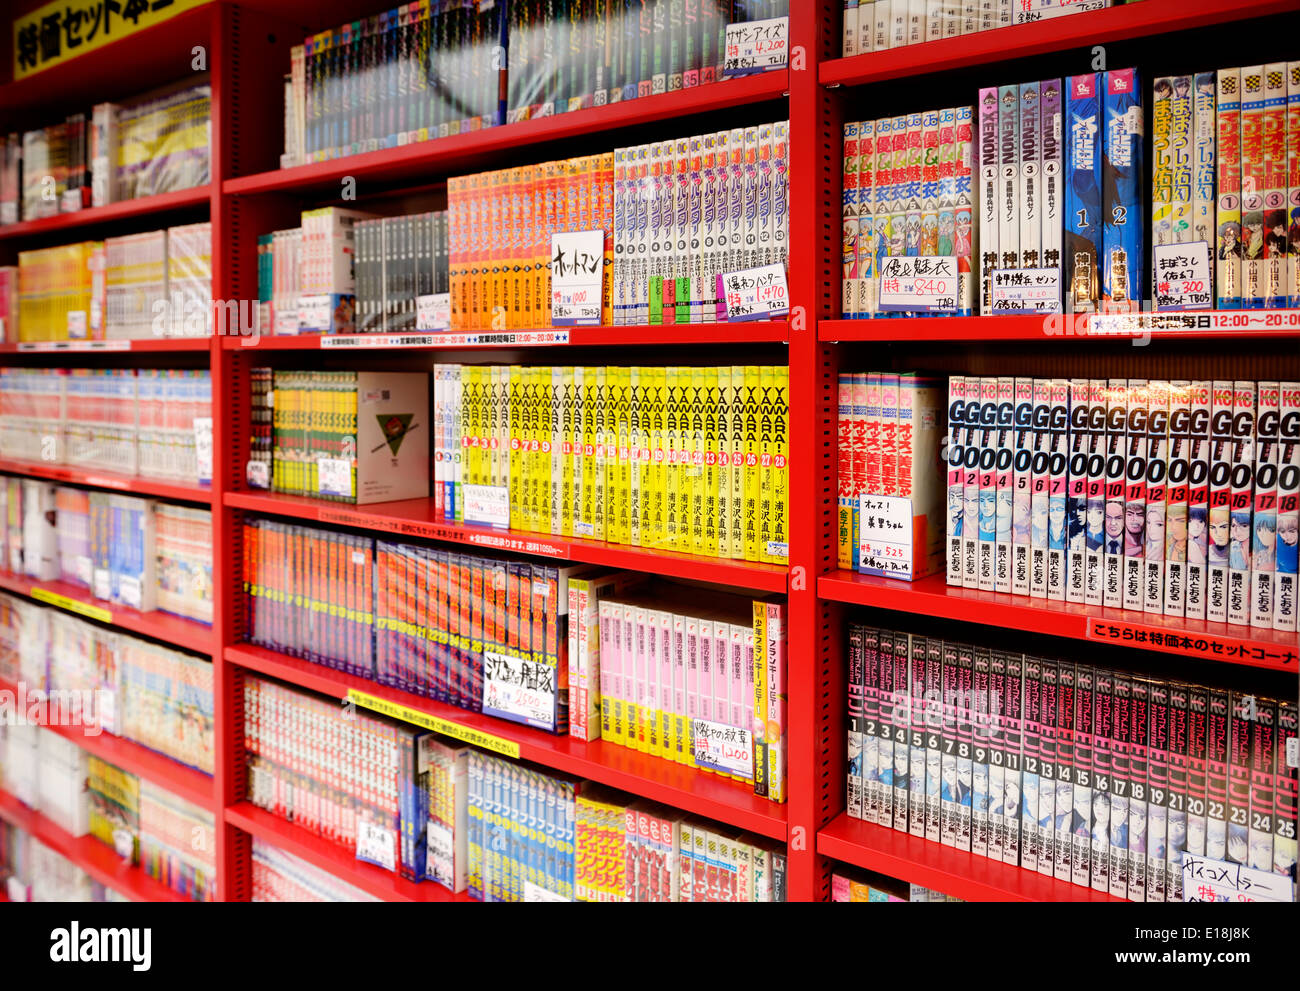 Manga comics books on book shelves at a Japanese store. Tokyo, Japan. - Stock Image